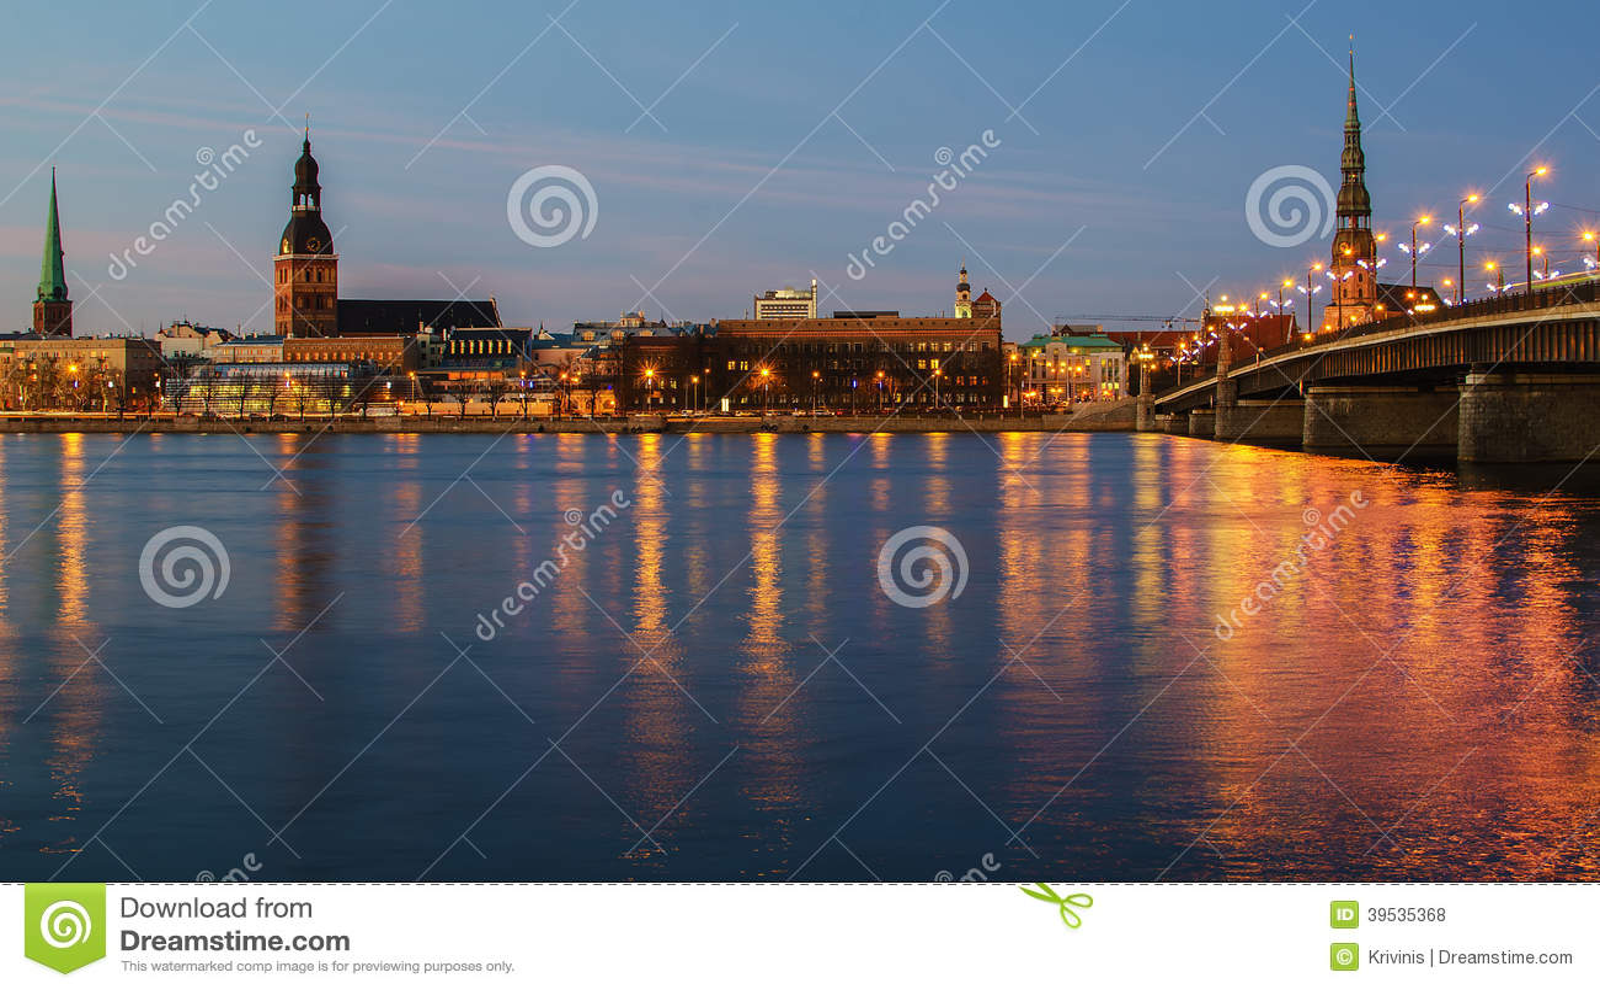 Download Riga (Latvia)  at night stock photo. Image of evening - 39535368